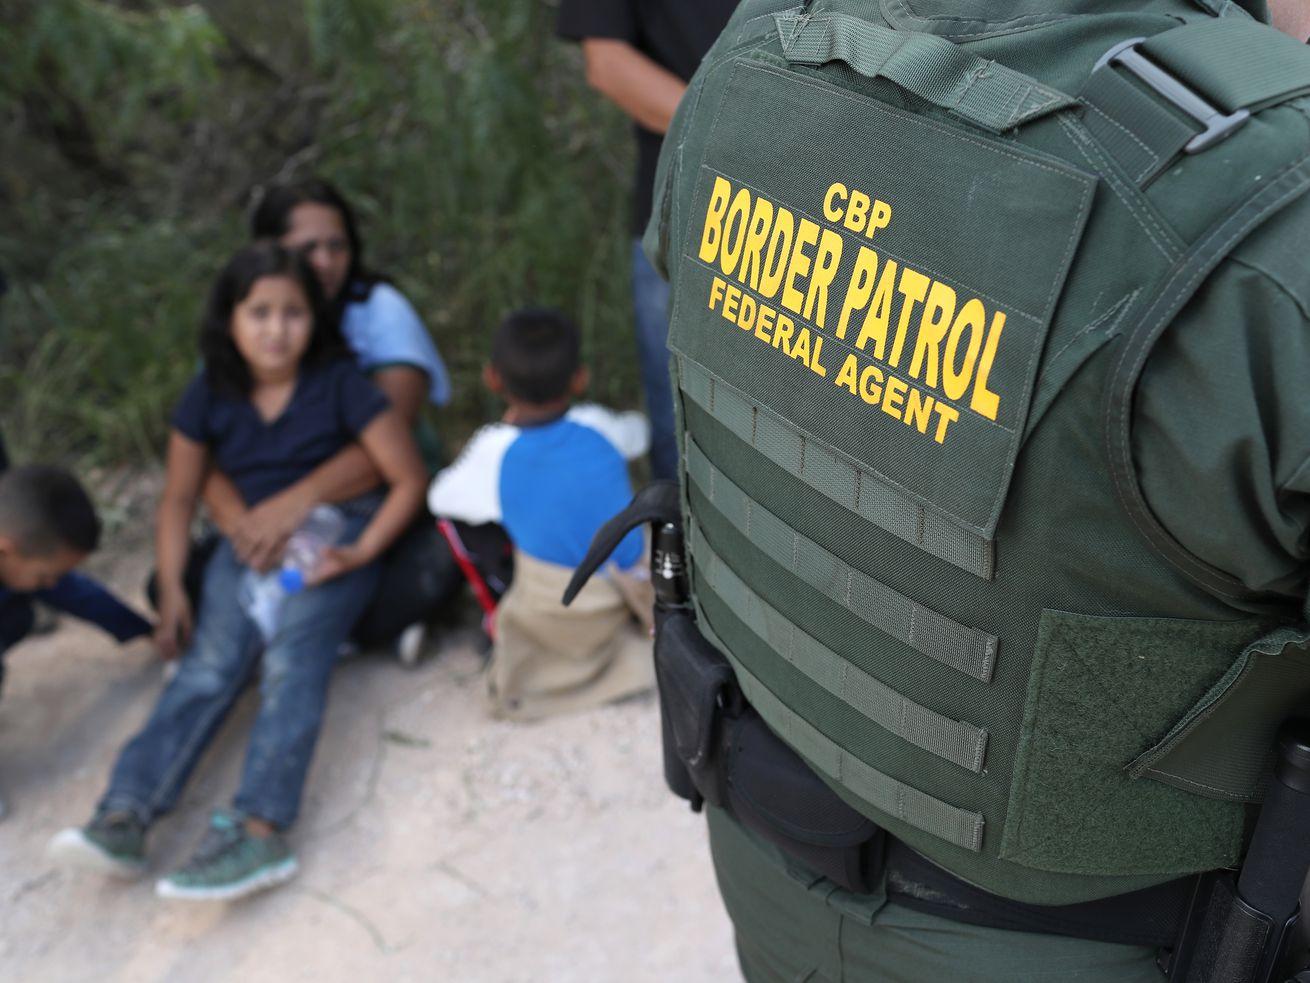 Central American asylum seekers wait as US Border Patrol agents take them into custody on June 12, 2018, near McAllen, Texas.